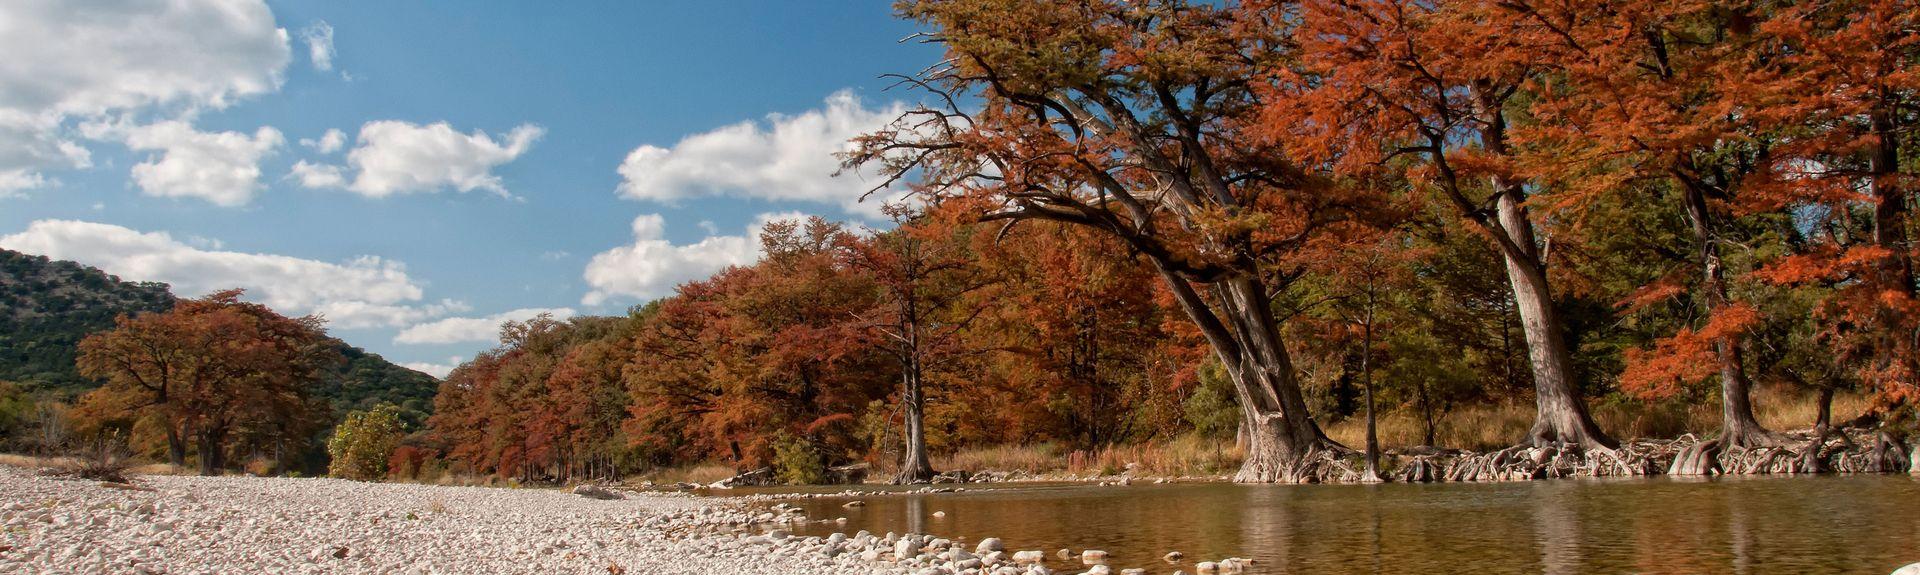 Garner State Park, Concan Vacation Rentals: cabin rentals ...